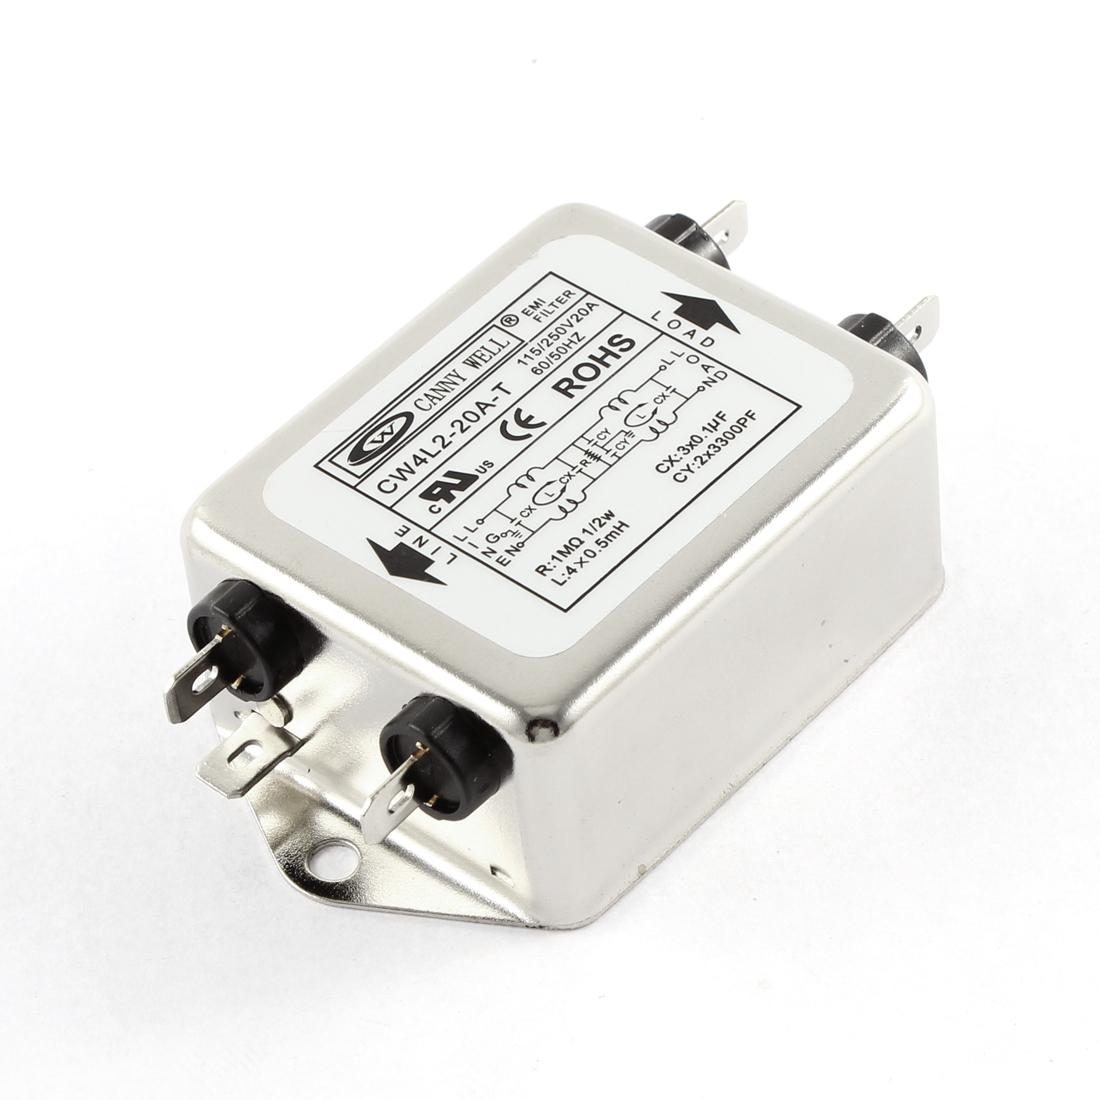 AC 115/250V 20A CW4L2-20A-T Noise Suppressor Power EMI Filter